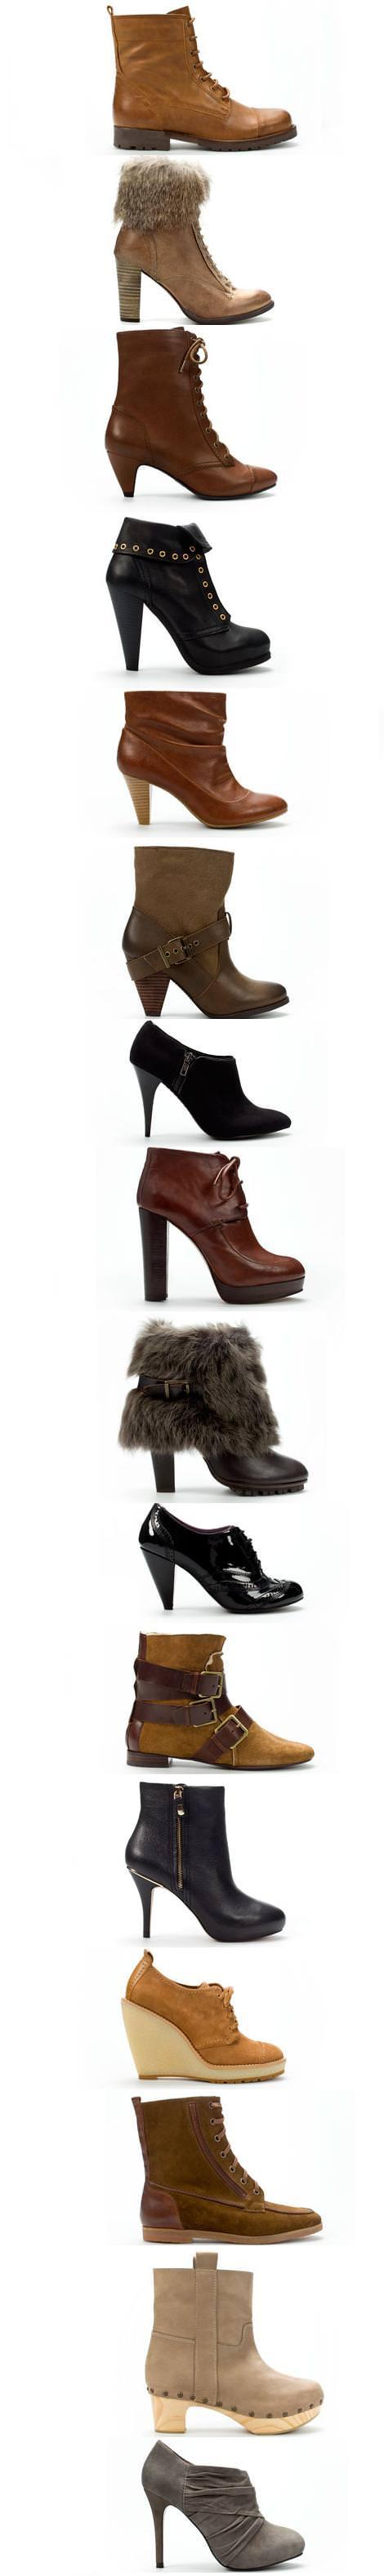 Botines de Zara (otoño invierno 2010 2011)